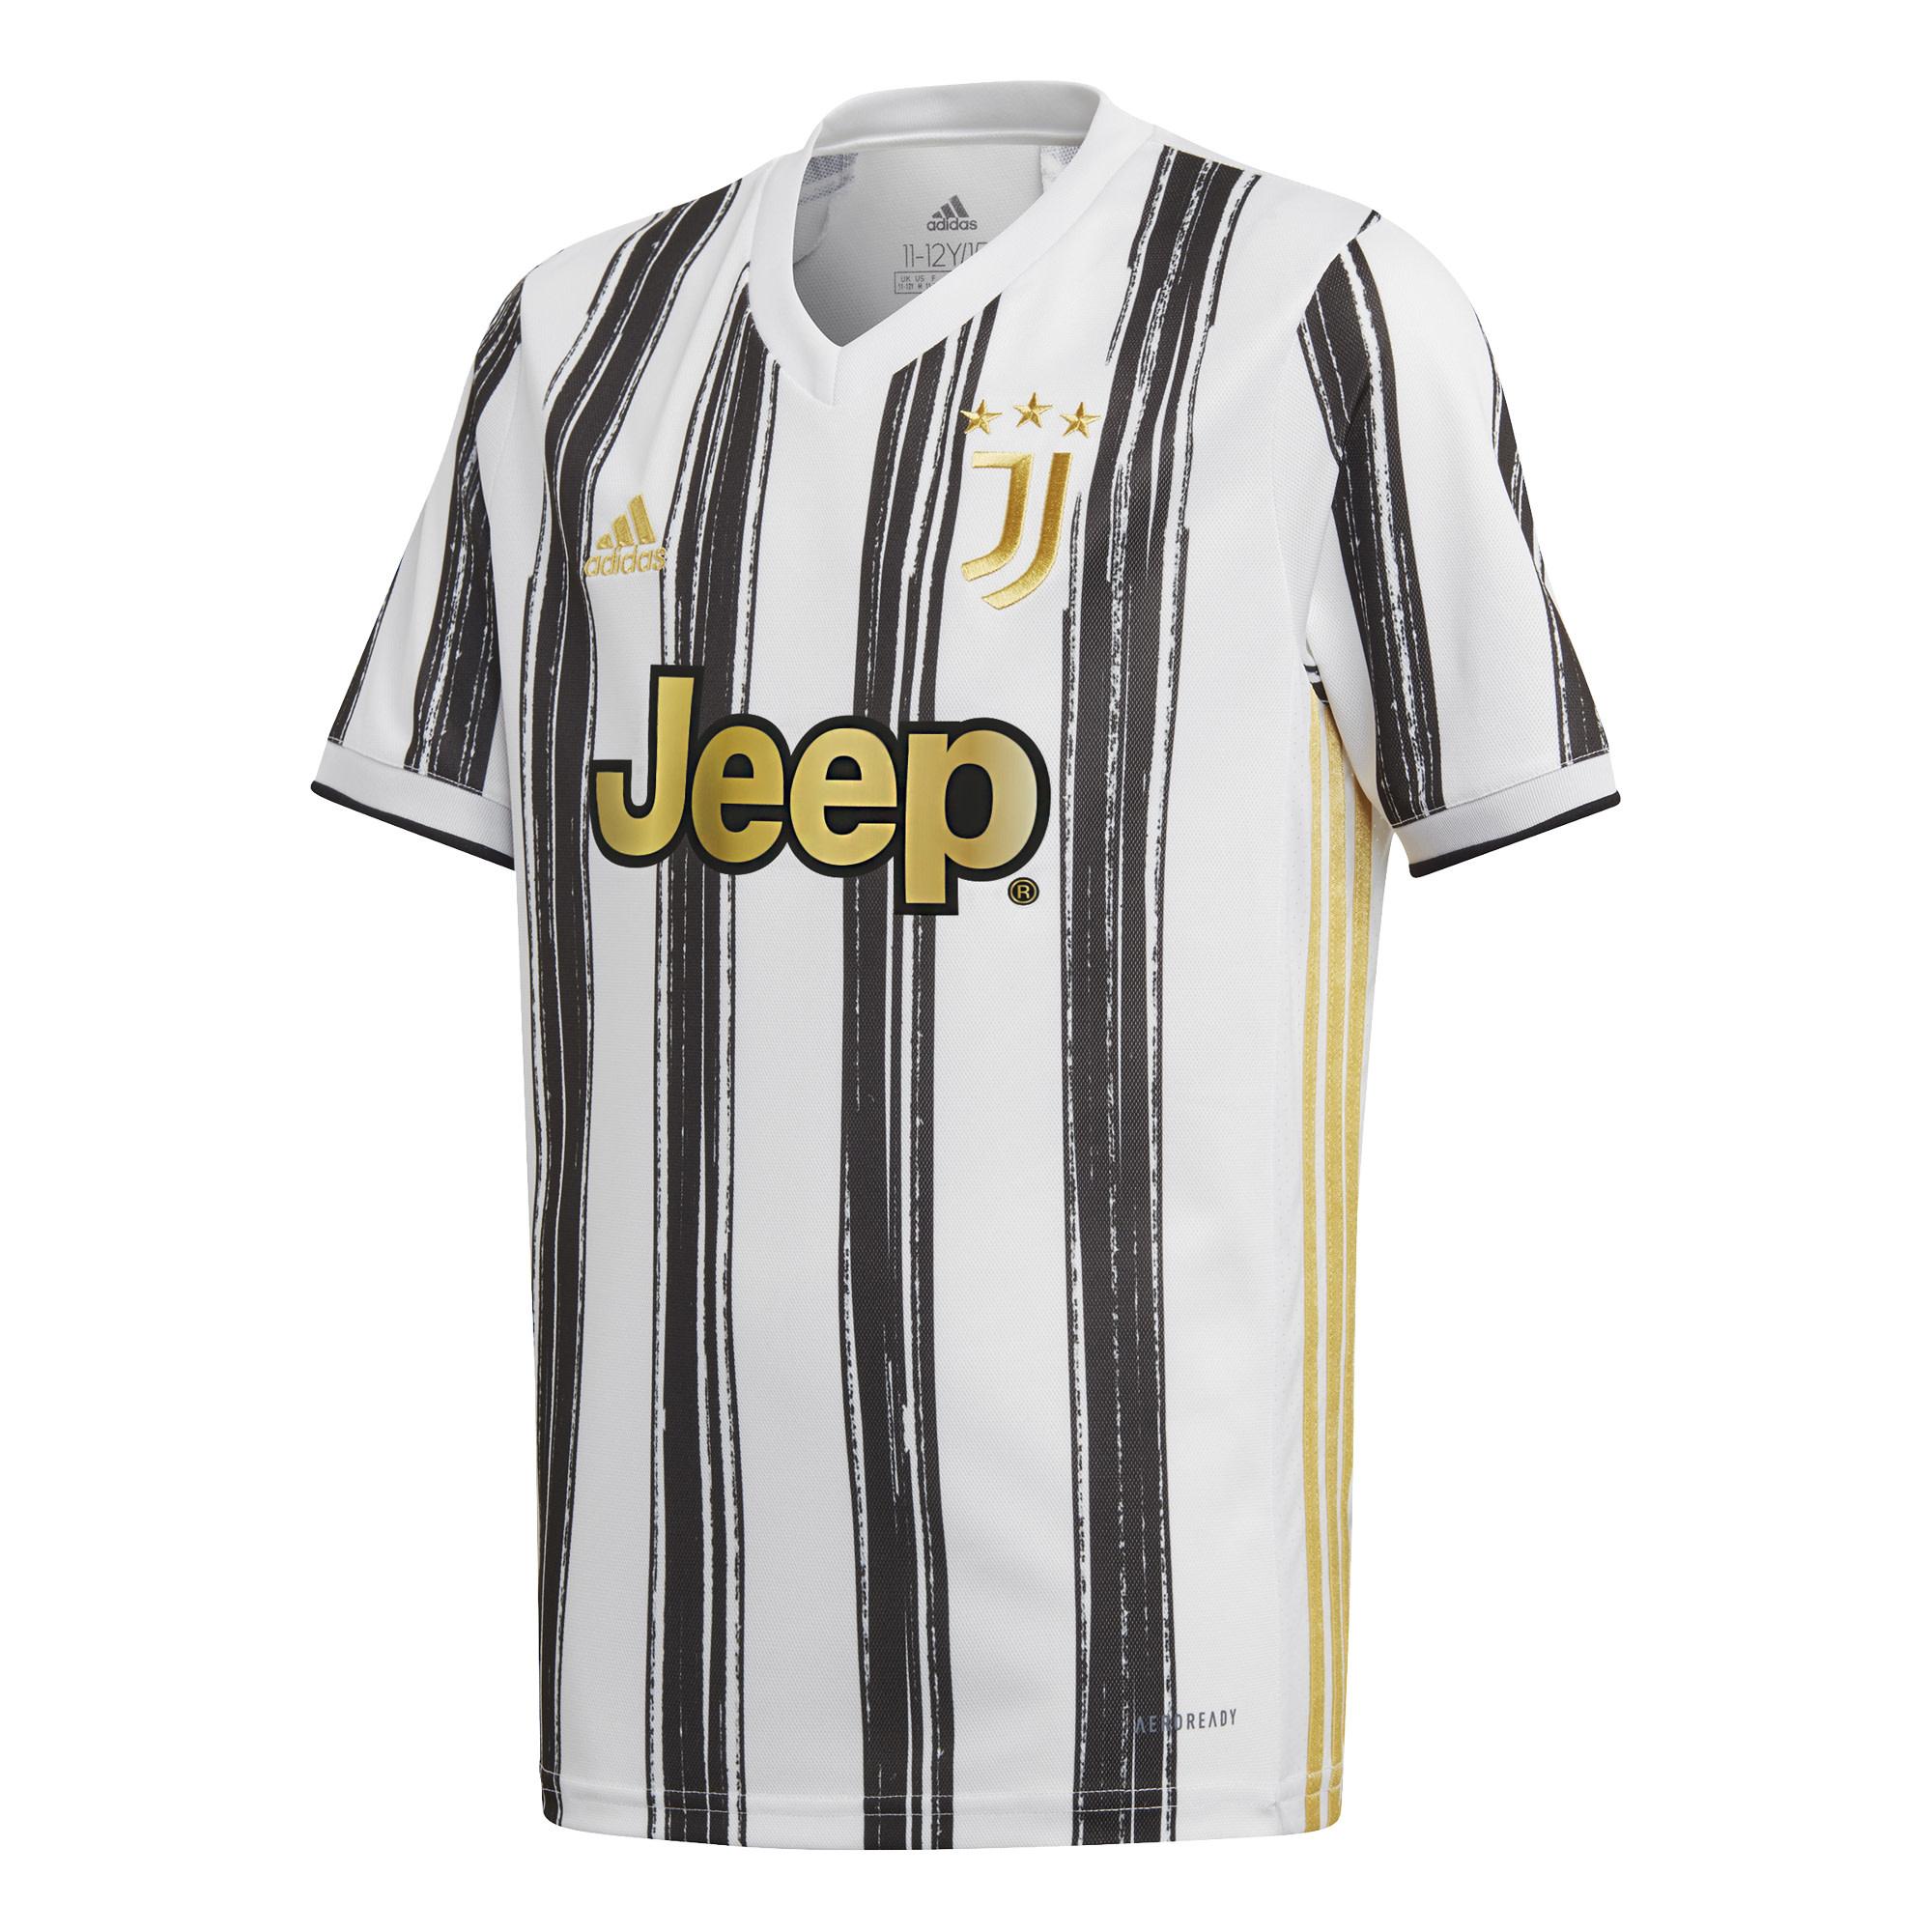 Adidas ADIDAS JR Juventus Home Jersey '20-'21